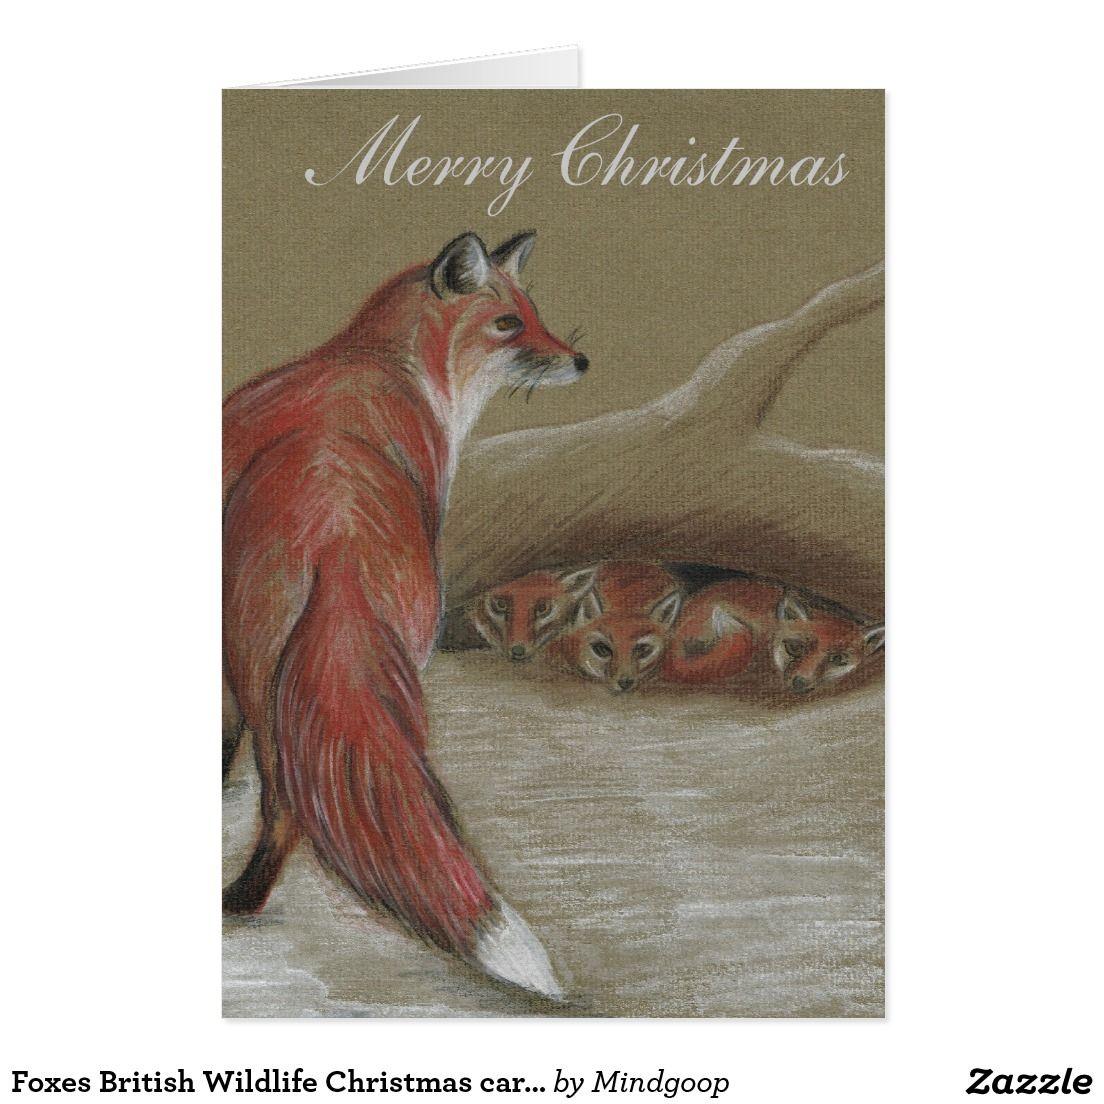 Foxes British Wildlife Christmas cards | Pinterest